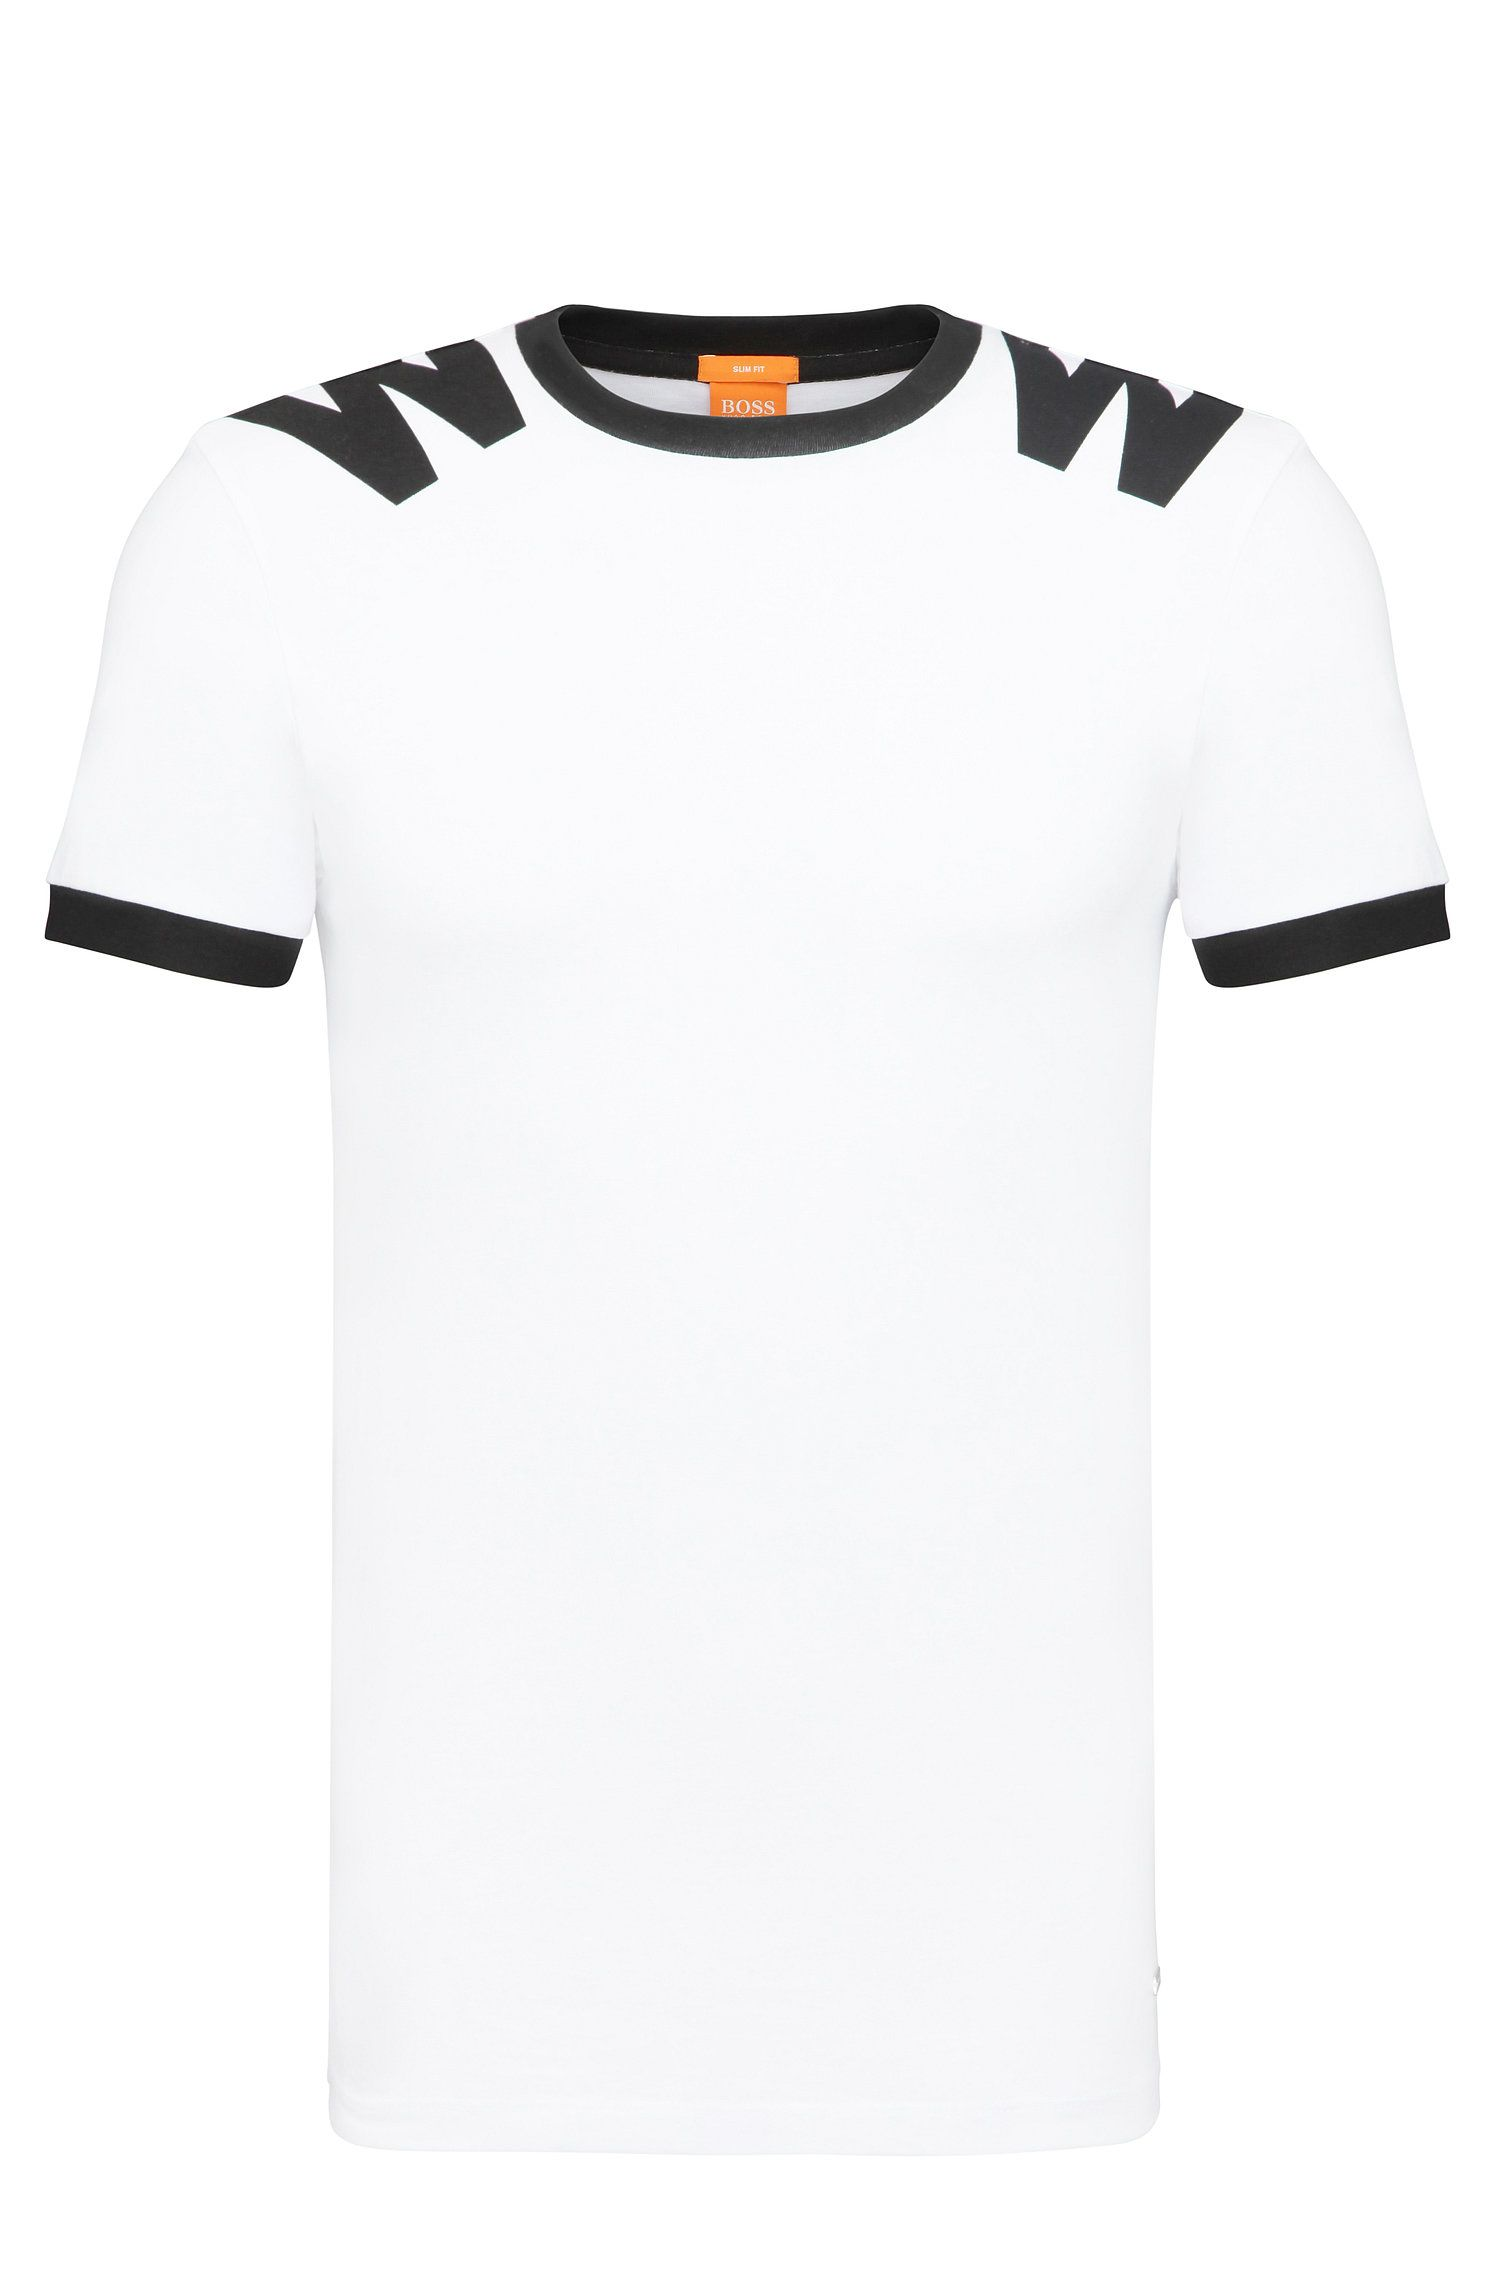 'Trying 1' | WOW Print T-Shirt